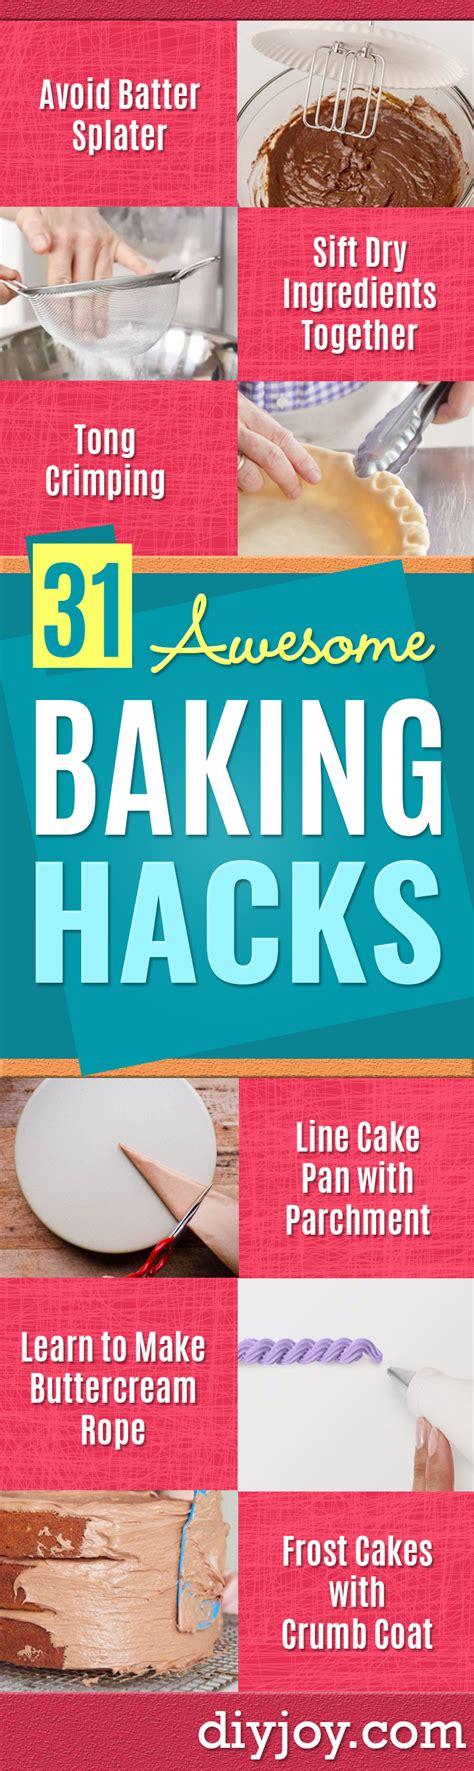 baking hacks 31 baking hacks you ve needed all your life